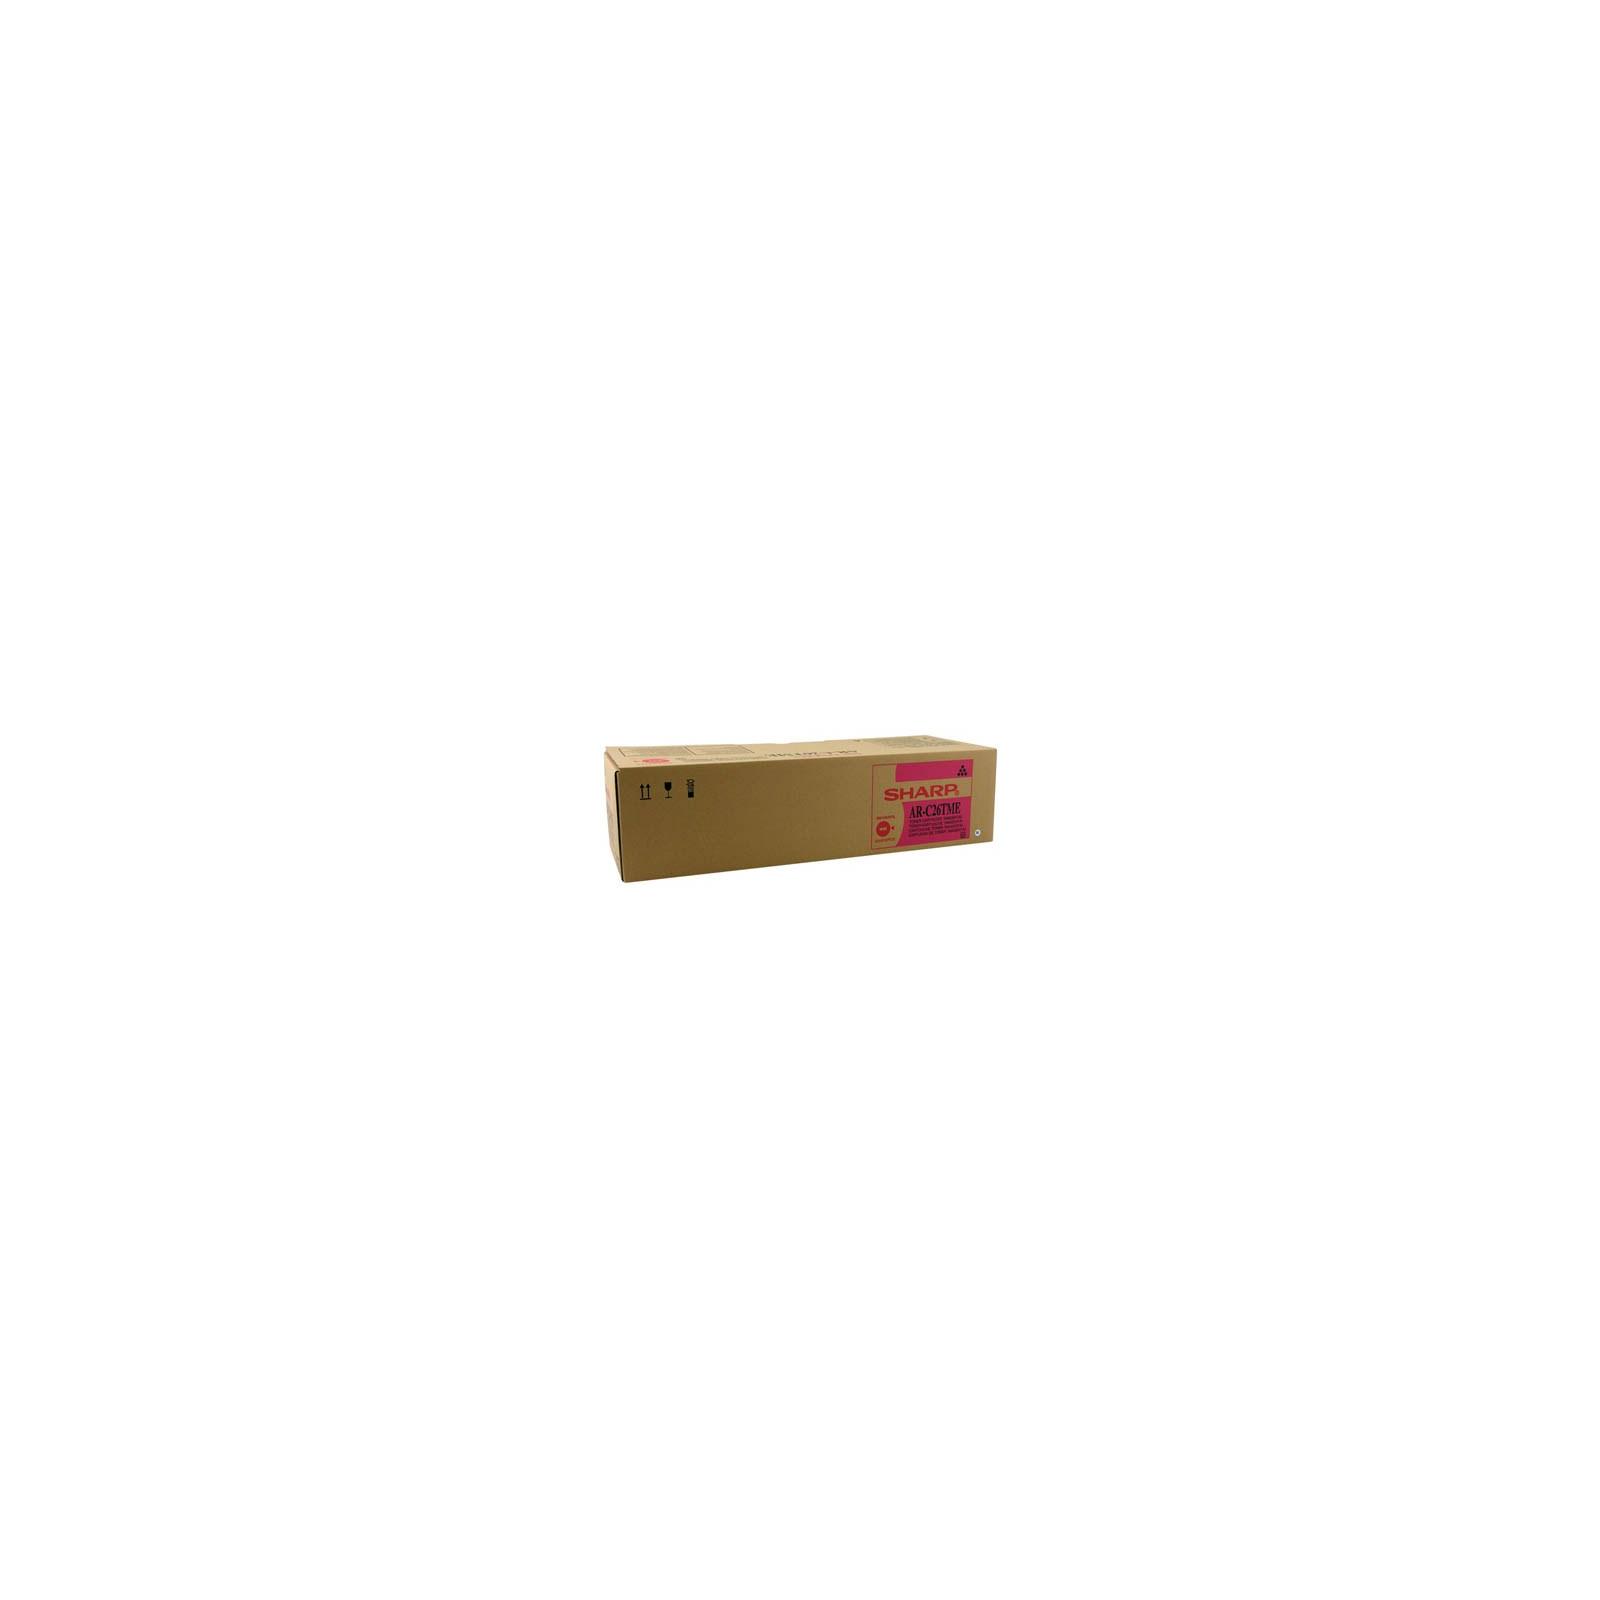 Тонер-картридж SHARP AR C26TME Magenta(дляARC170/172/262 (ARC26TME)